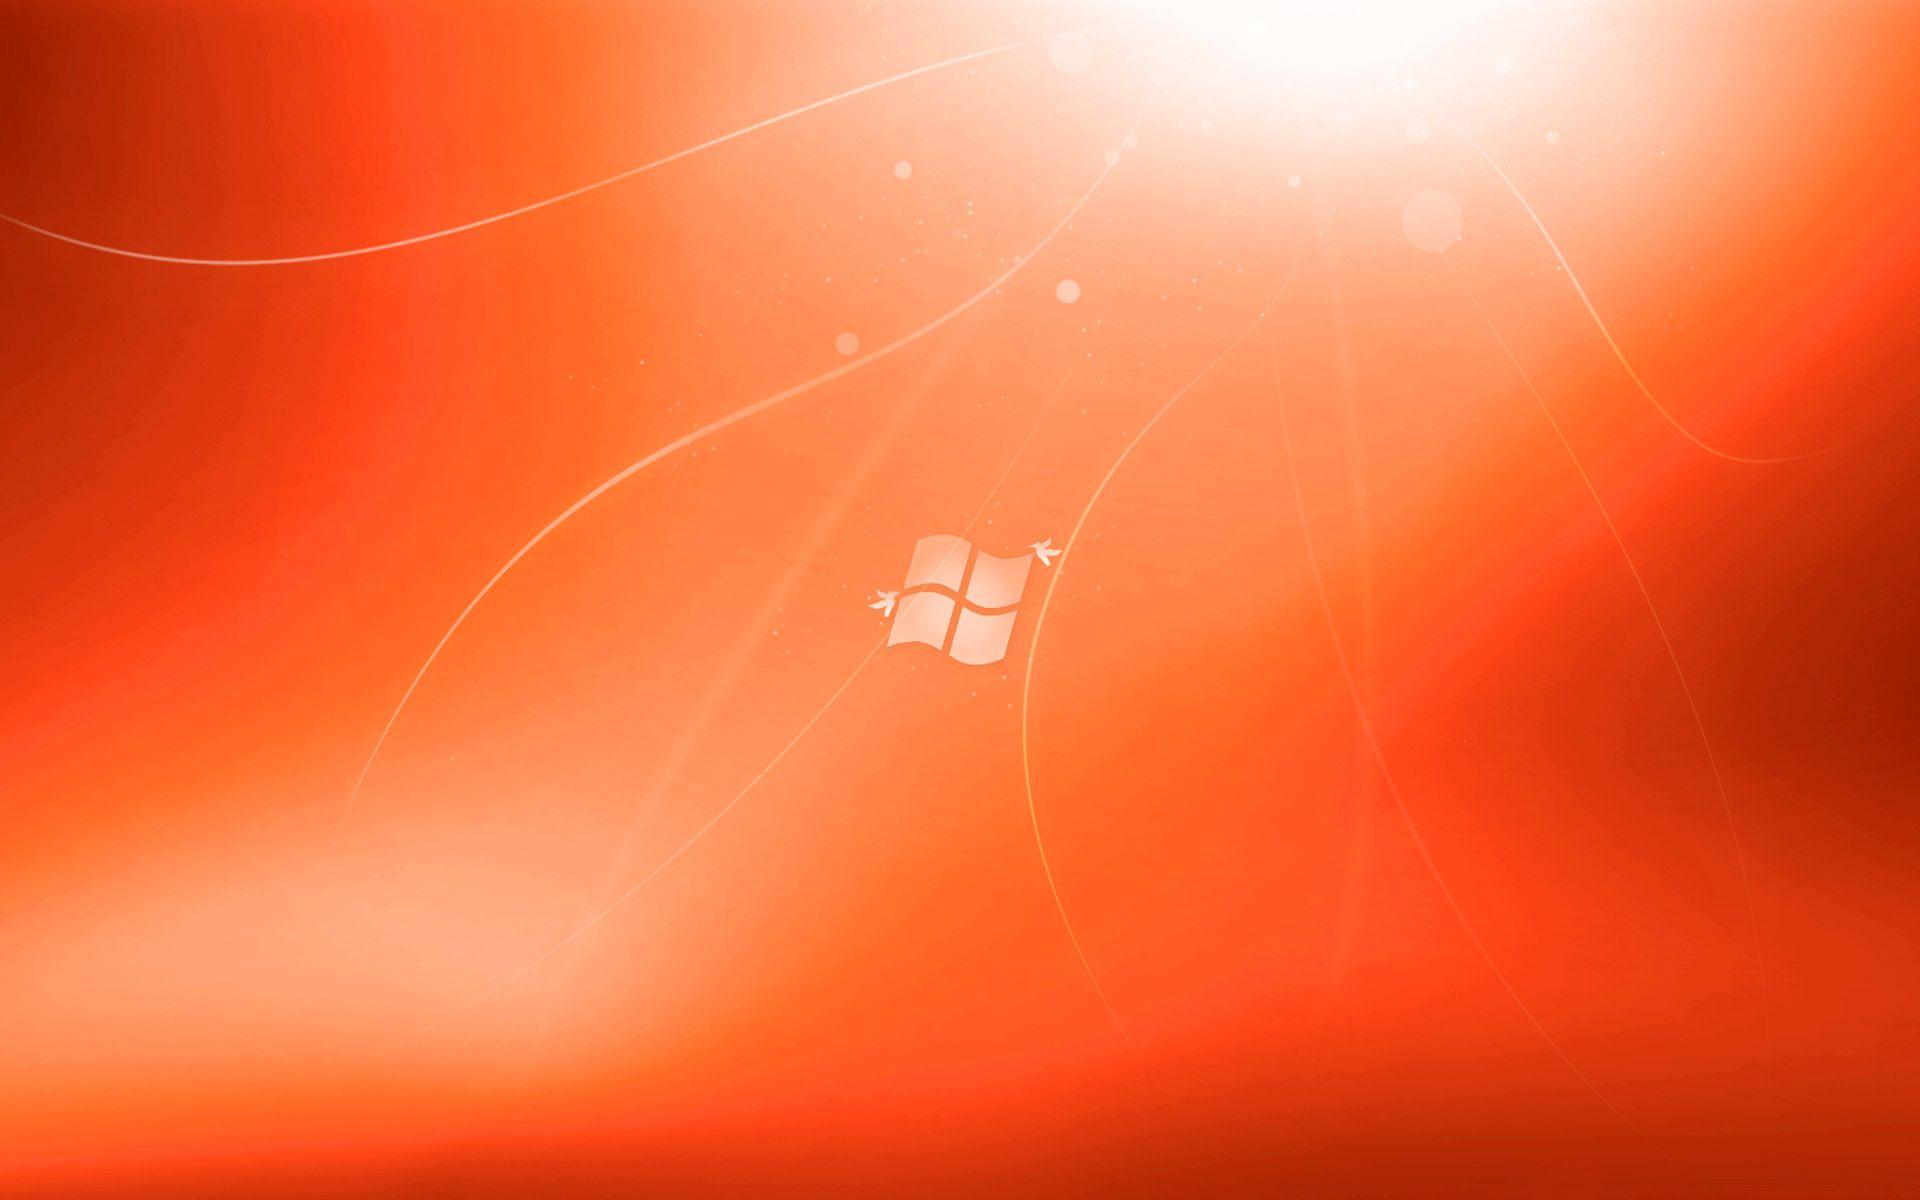 spectacular windows 7 wallpaper hd httpimashon combrands